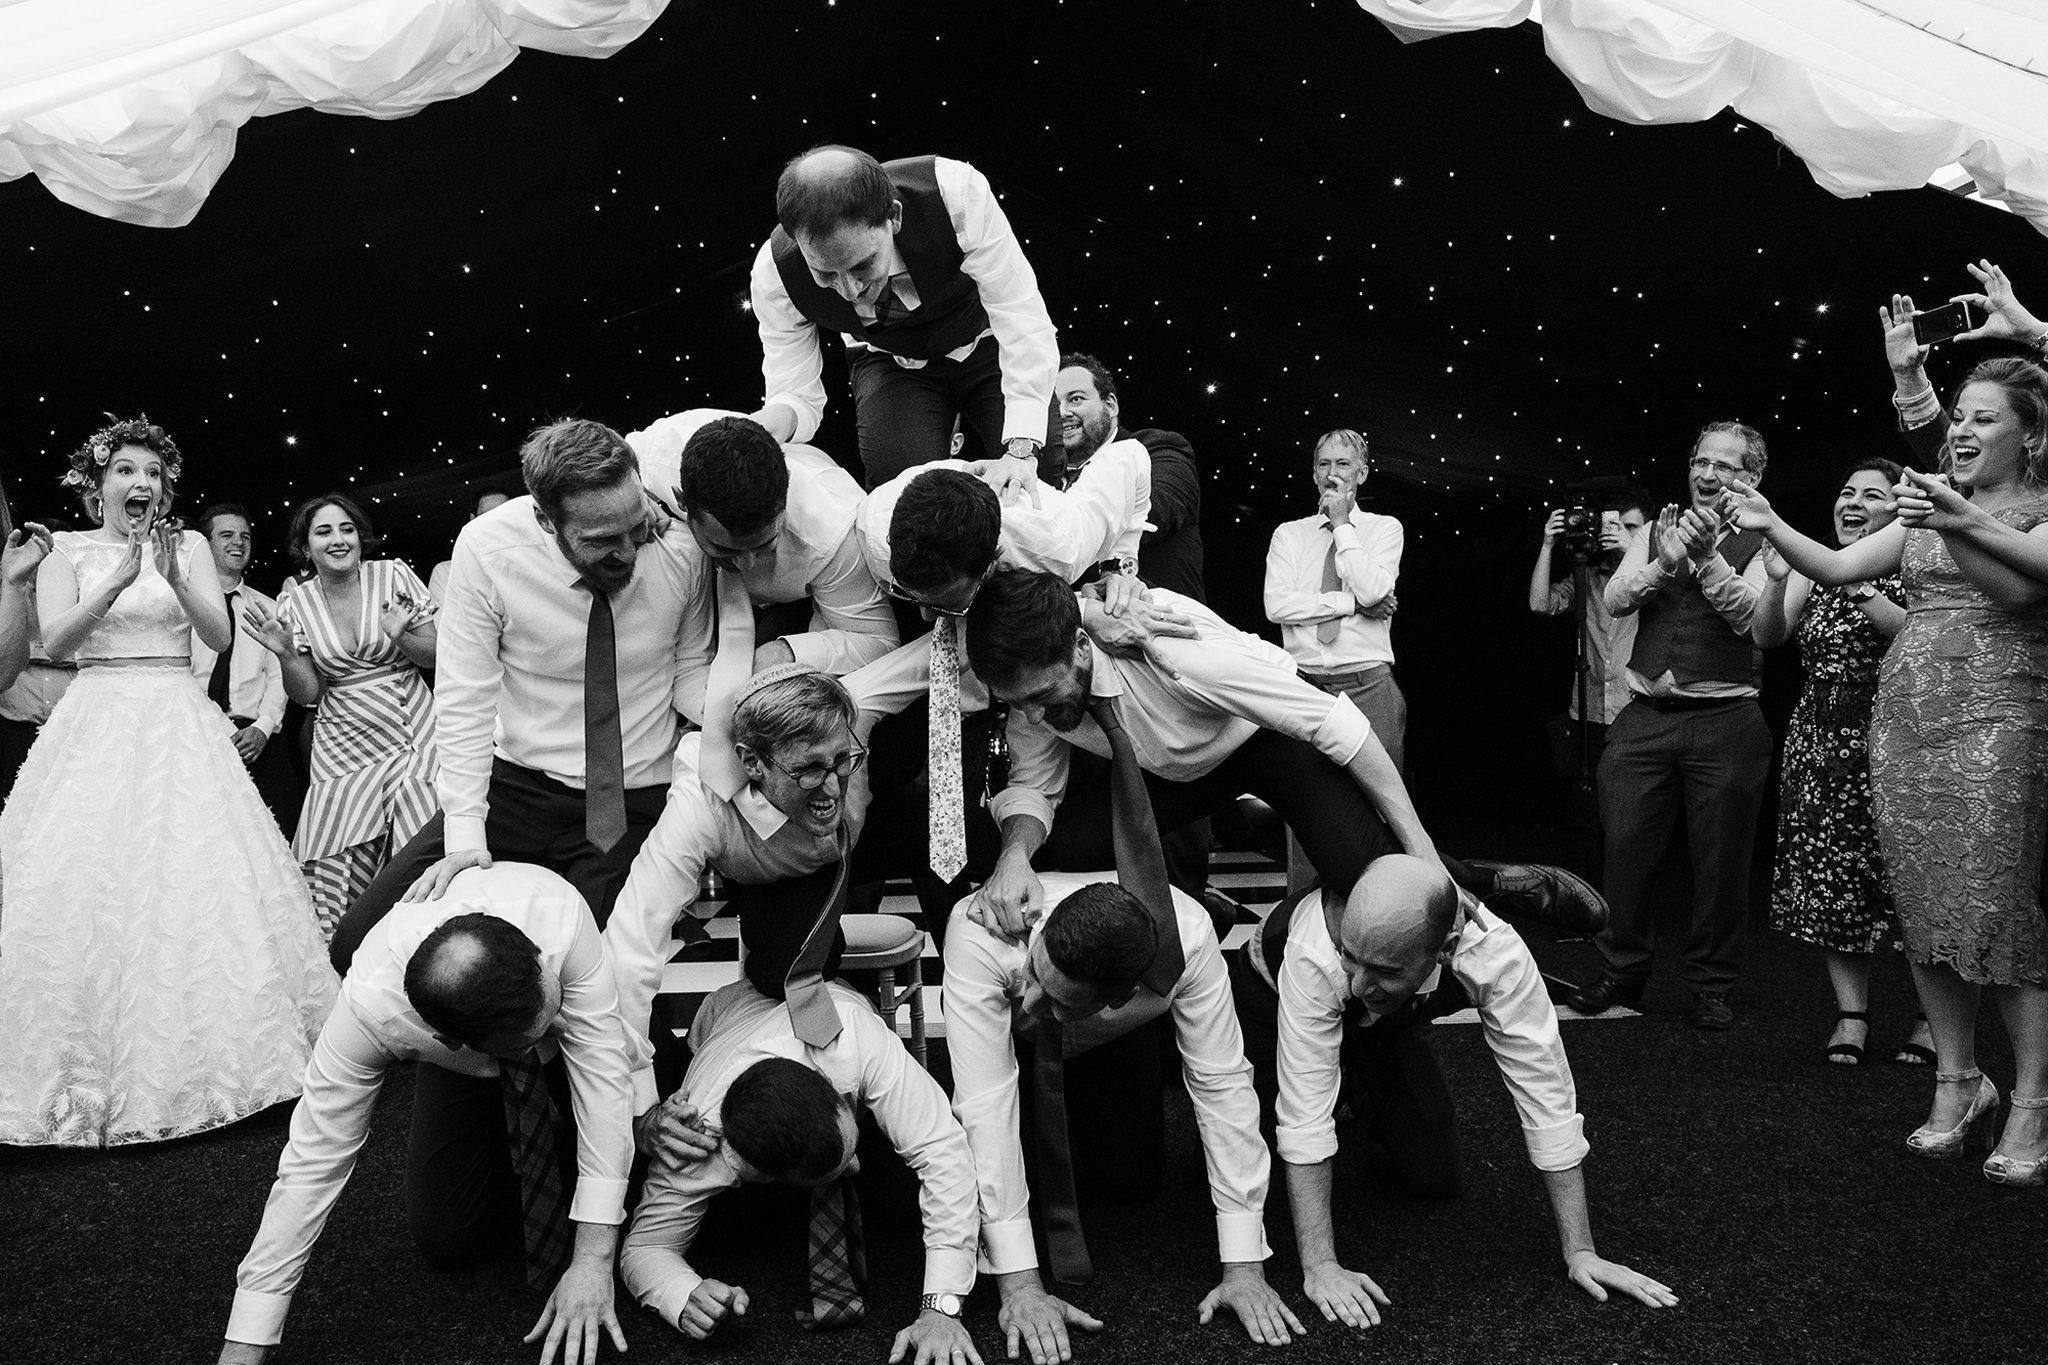 unstaged wedding photos